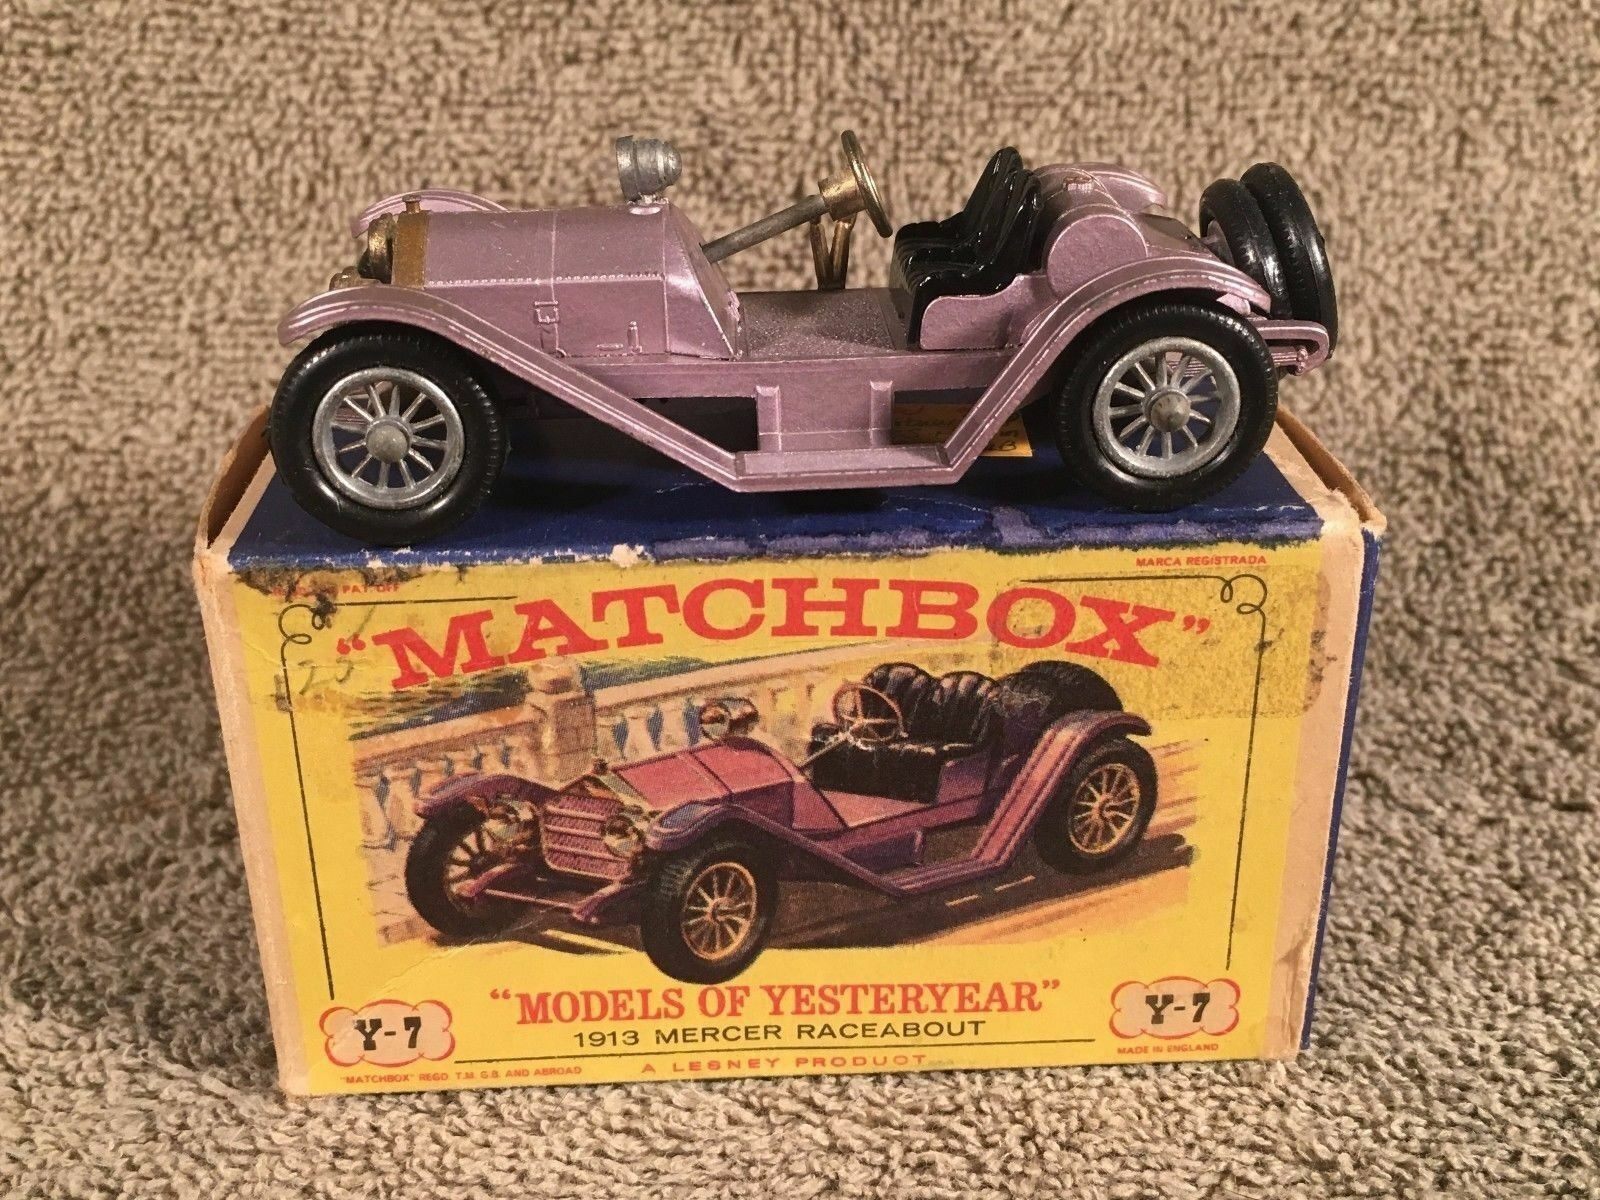 Modelos Matchbox de antaño 1913 Mercer Raceabout tipo 35J Y-7 Plateado Ruedas